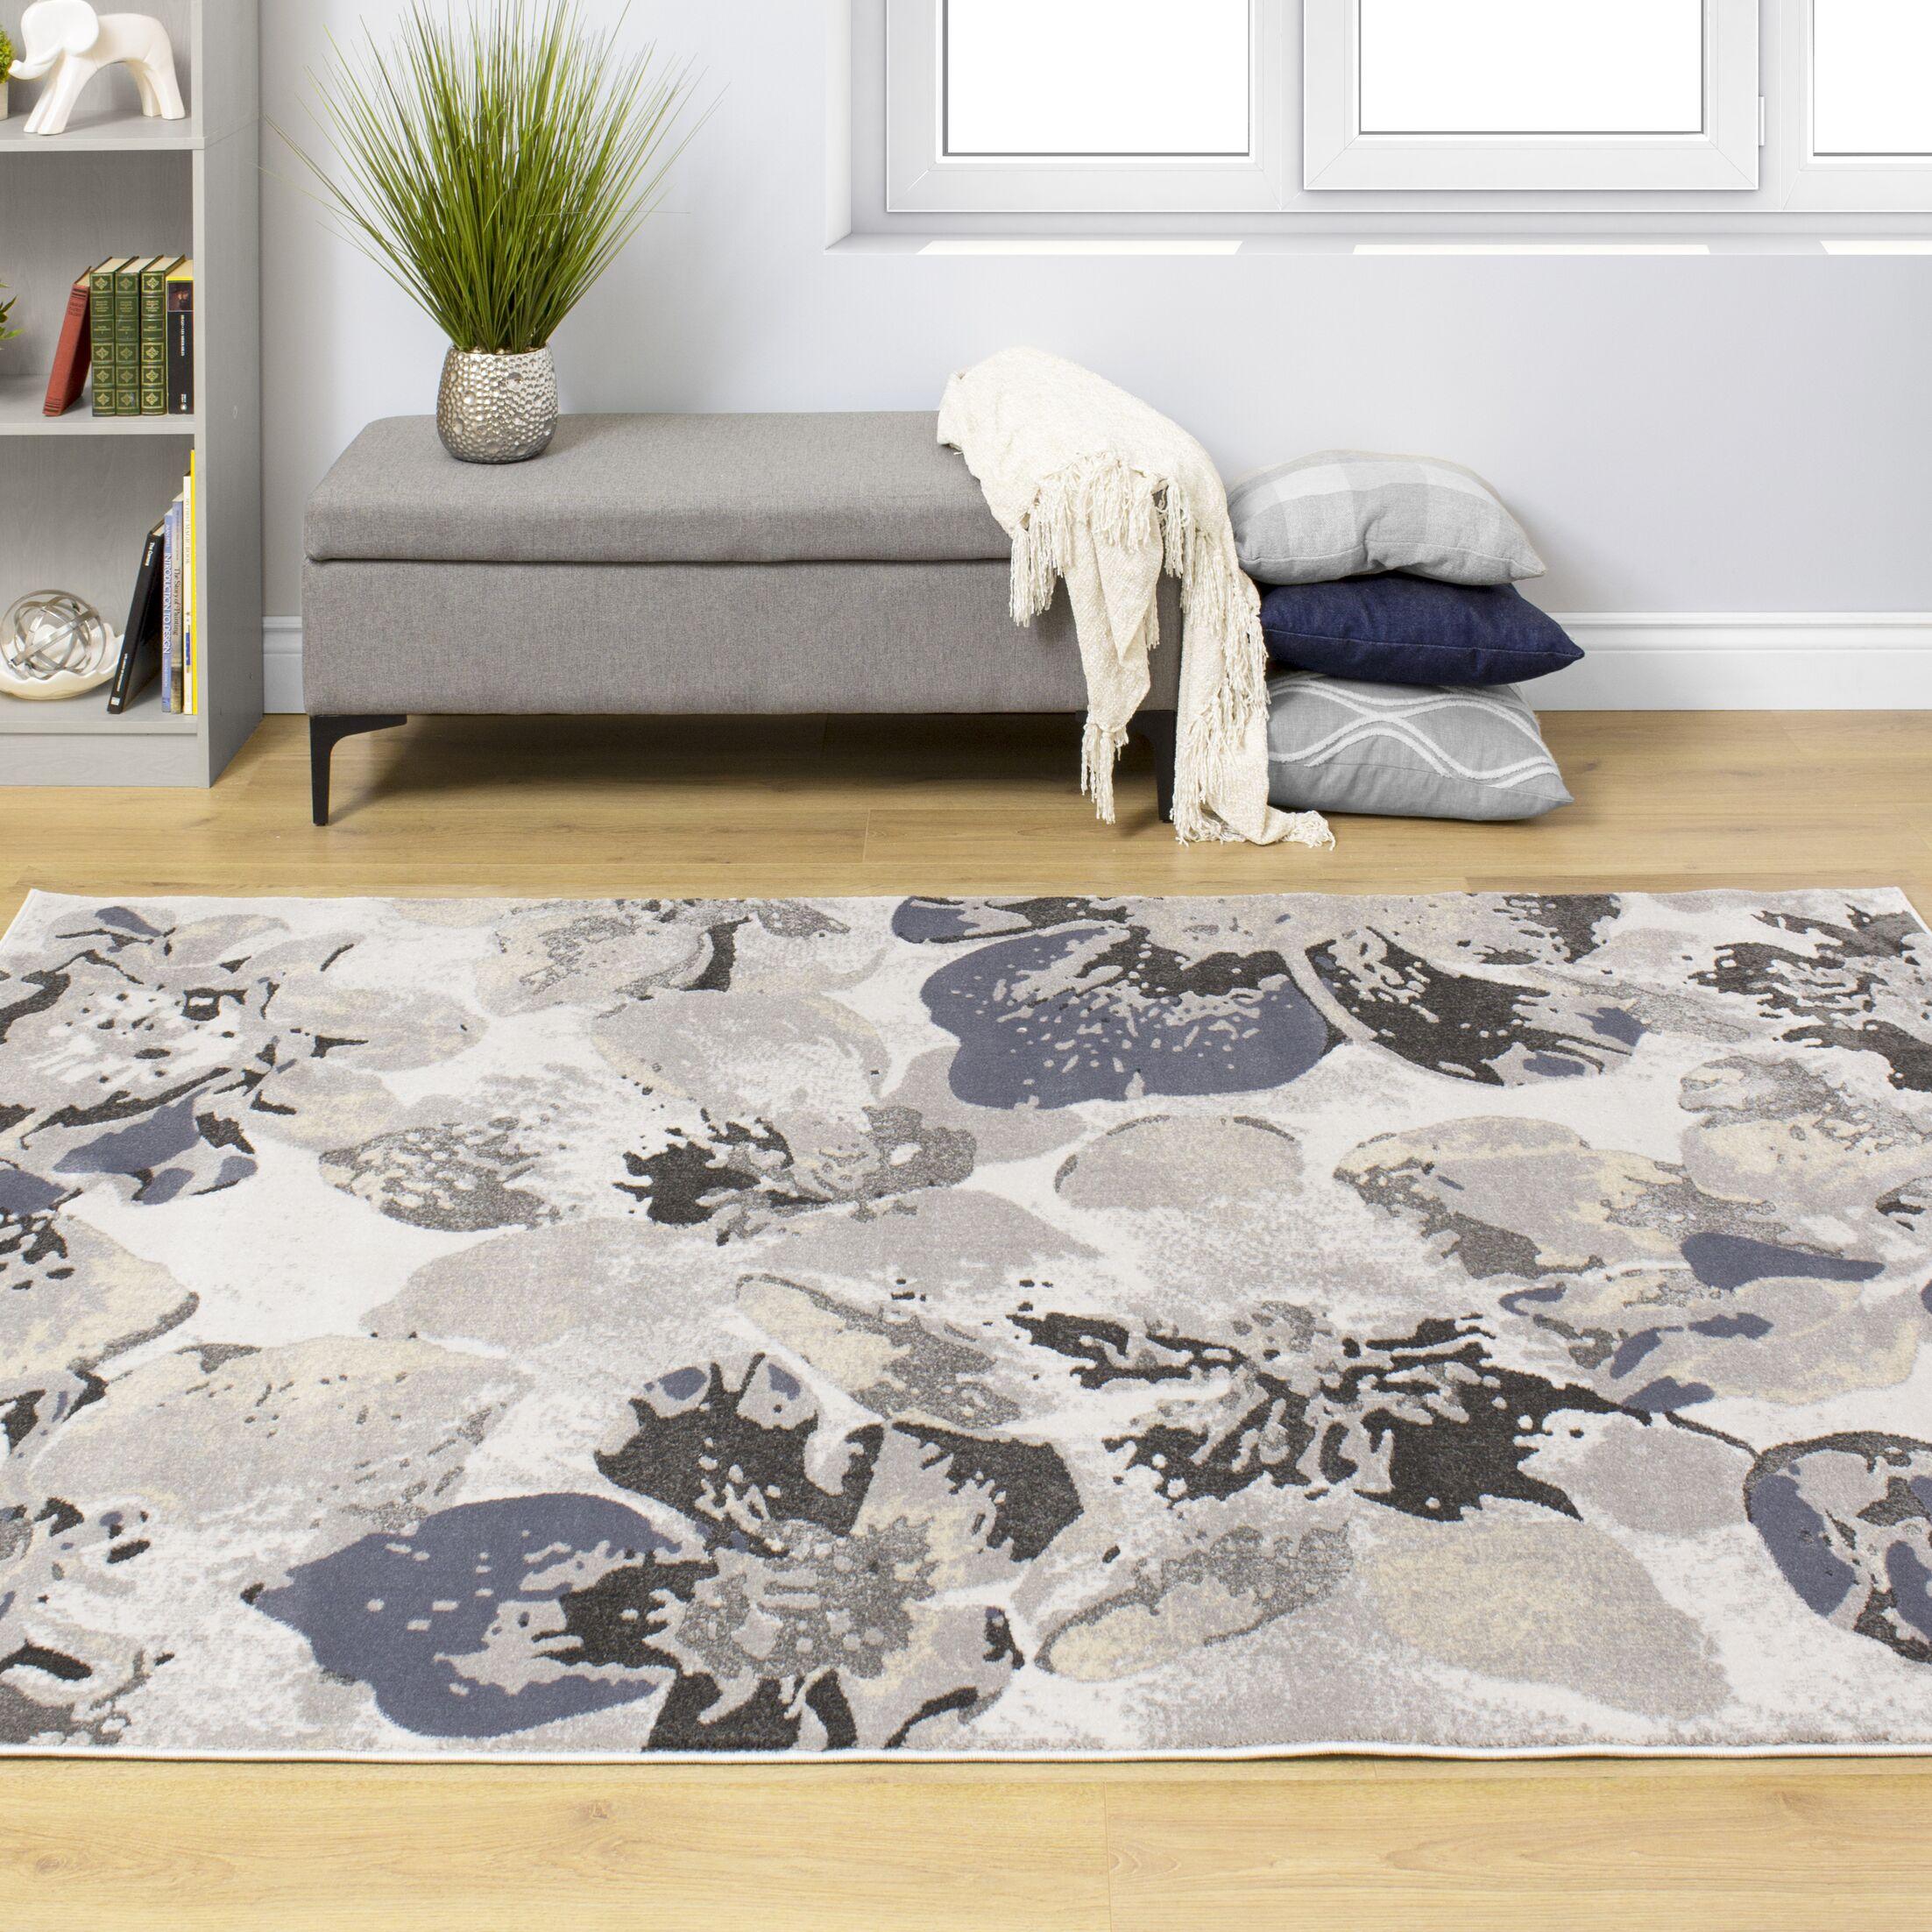 Lauryn Botanical Cream/Gray Area Rug Rug Size: Rectangle 5'3'' x 7'7''